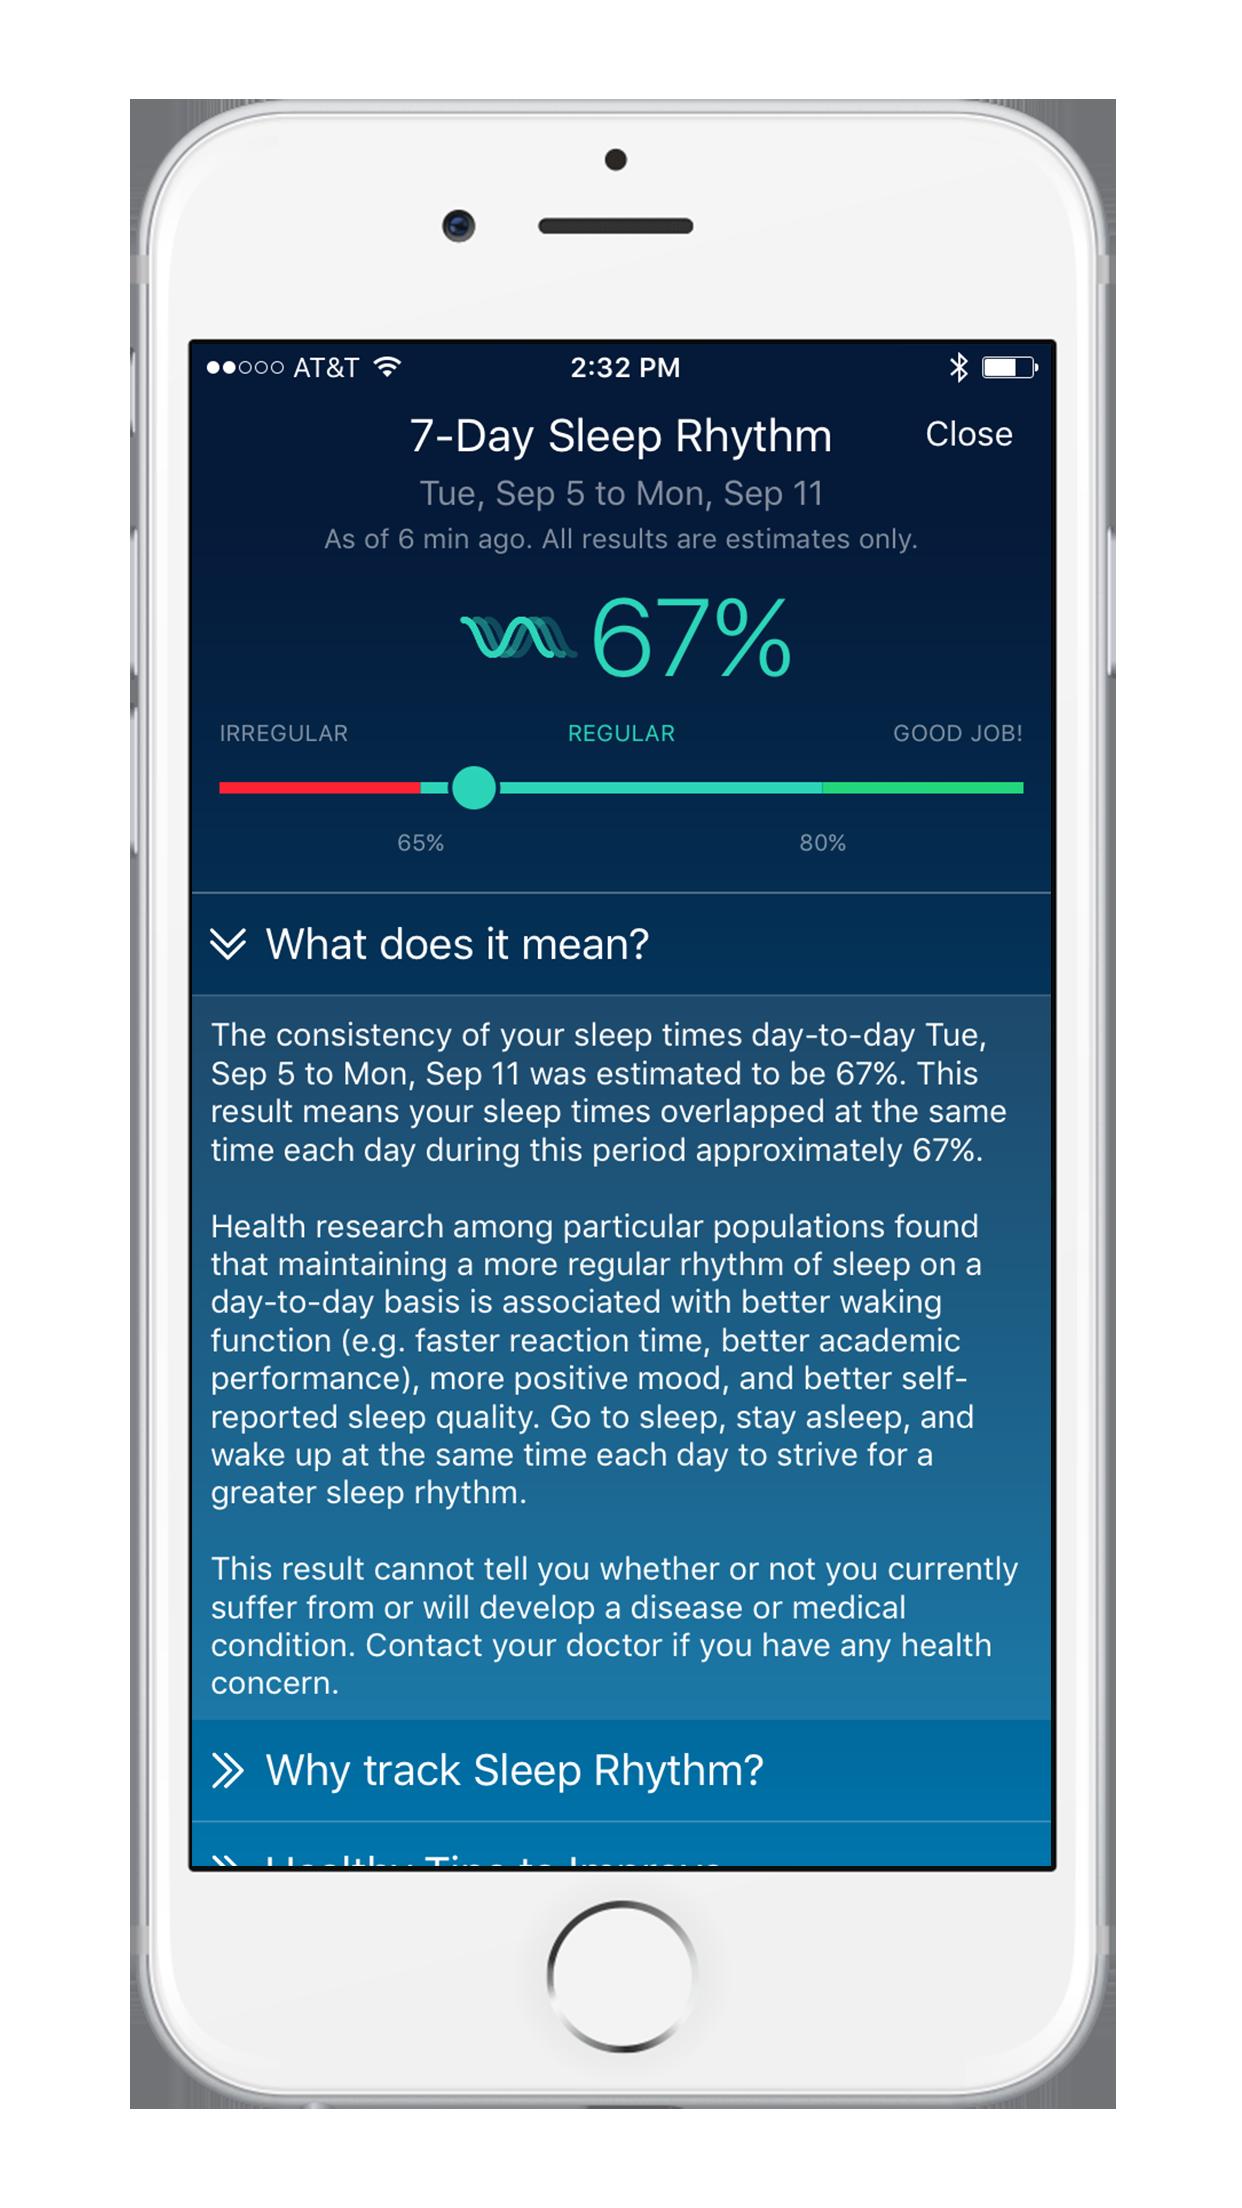 Sleep Watch Version 3 by Bodymatter on iPhone Sleep Rhythm Detail View